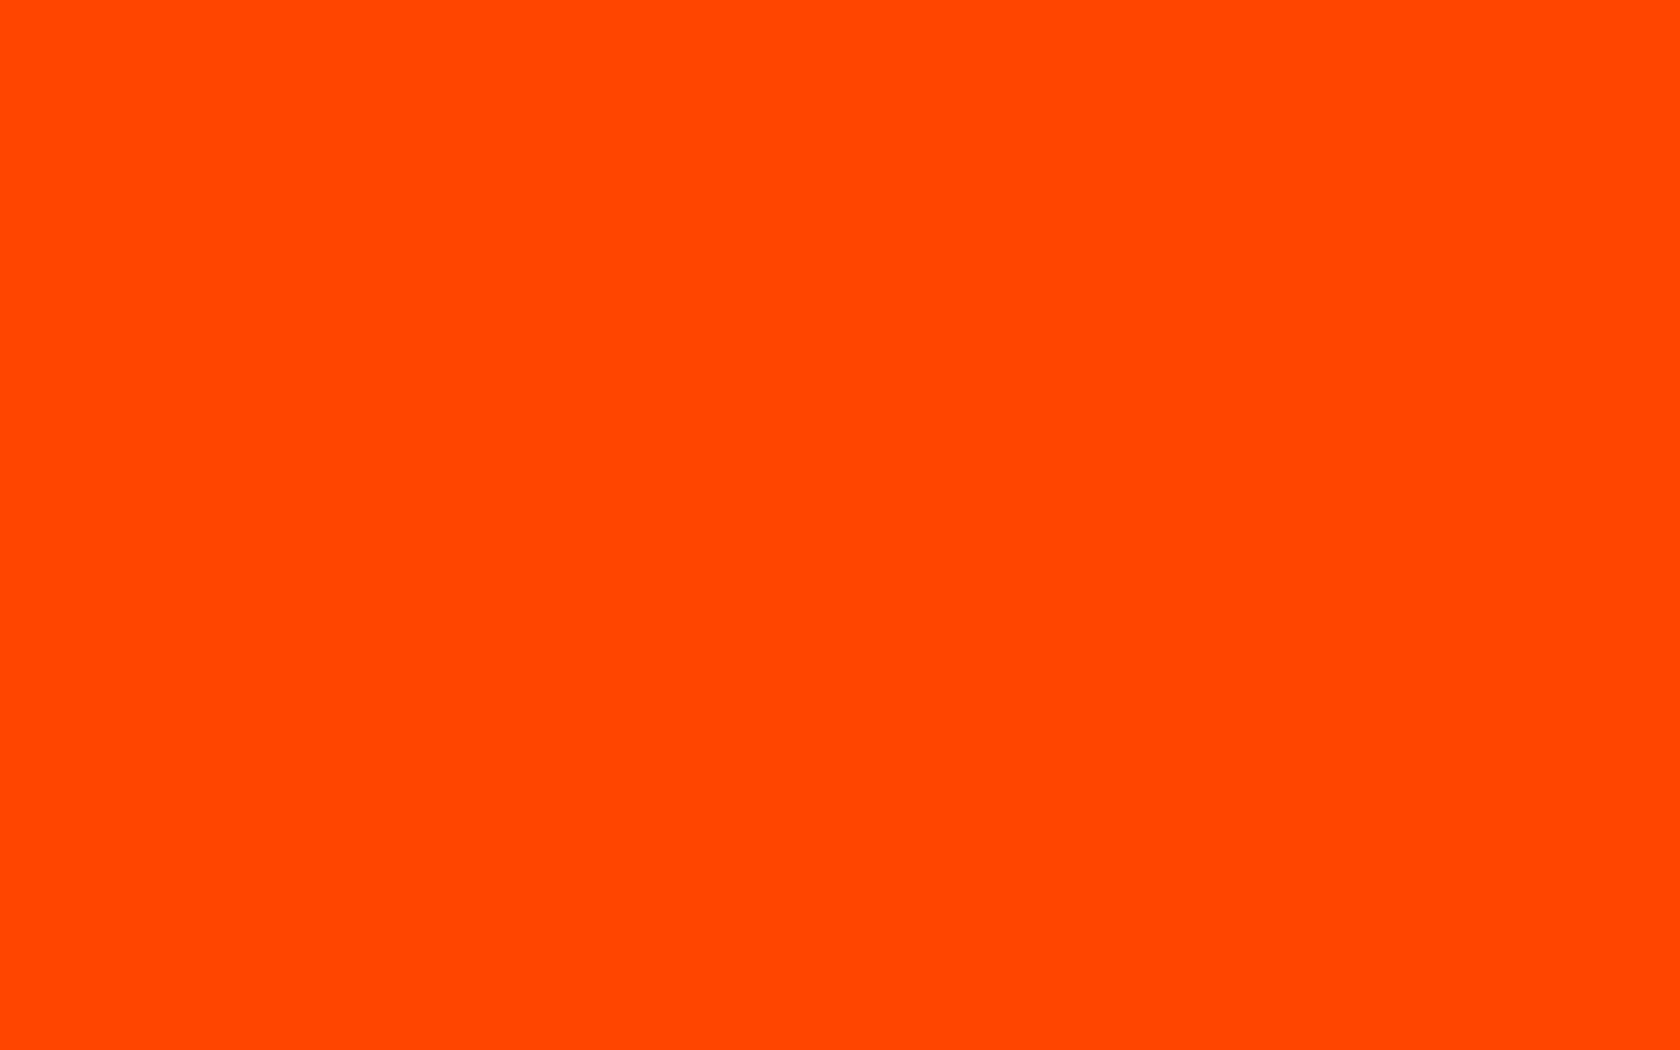 1680x1050 Orange-red Solid Color Background